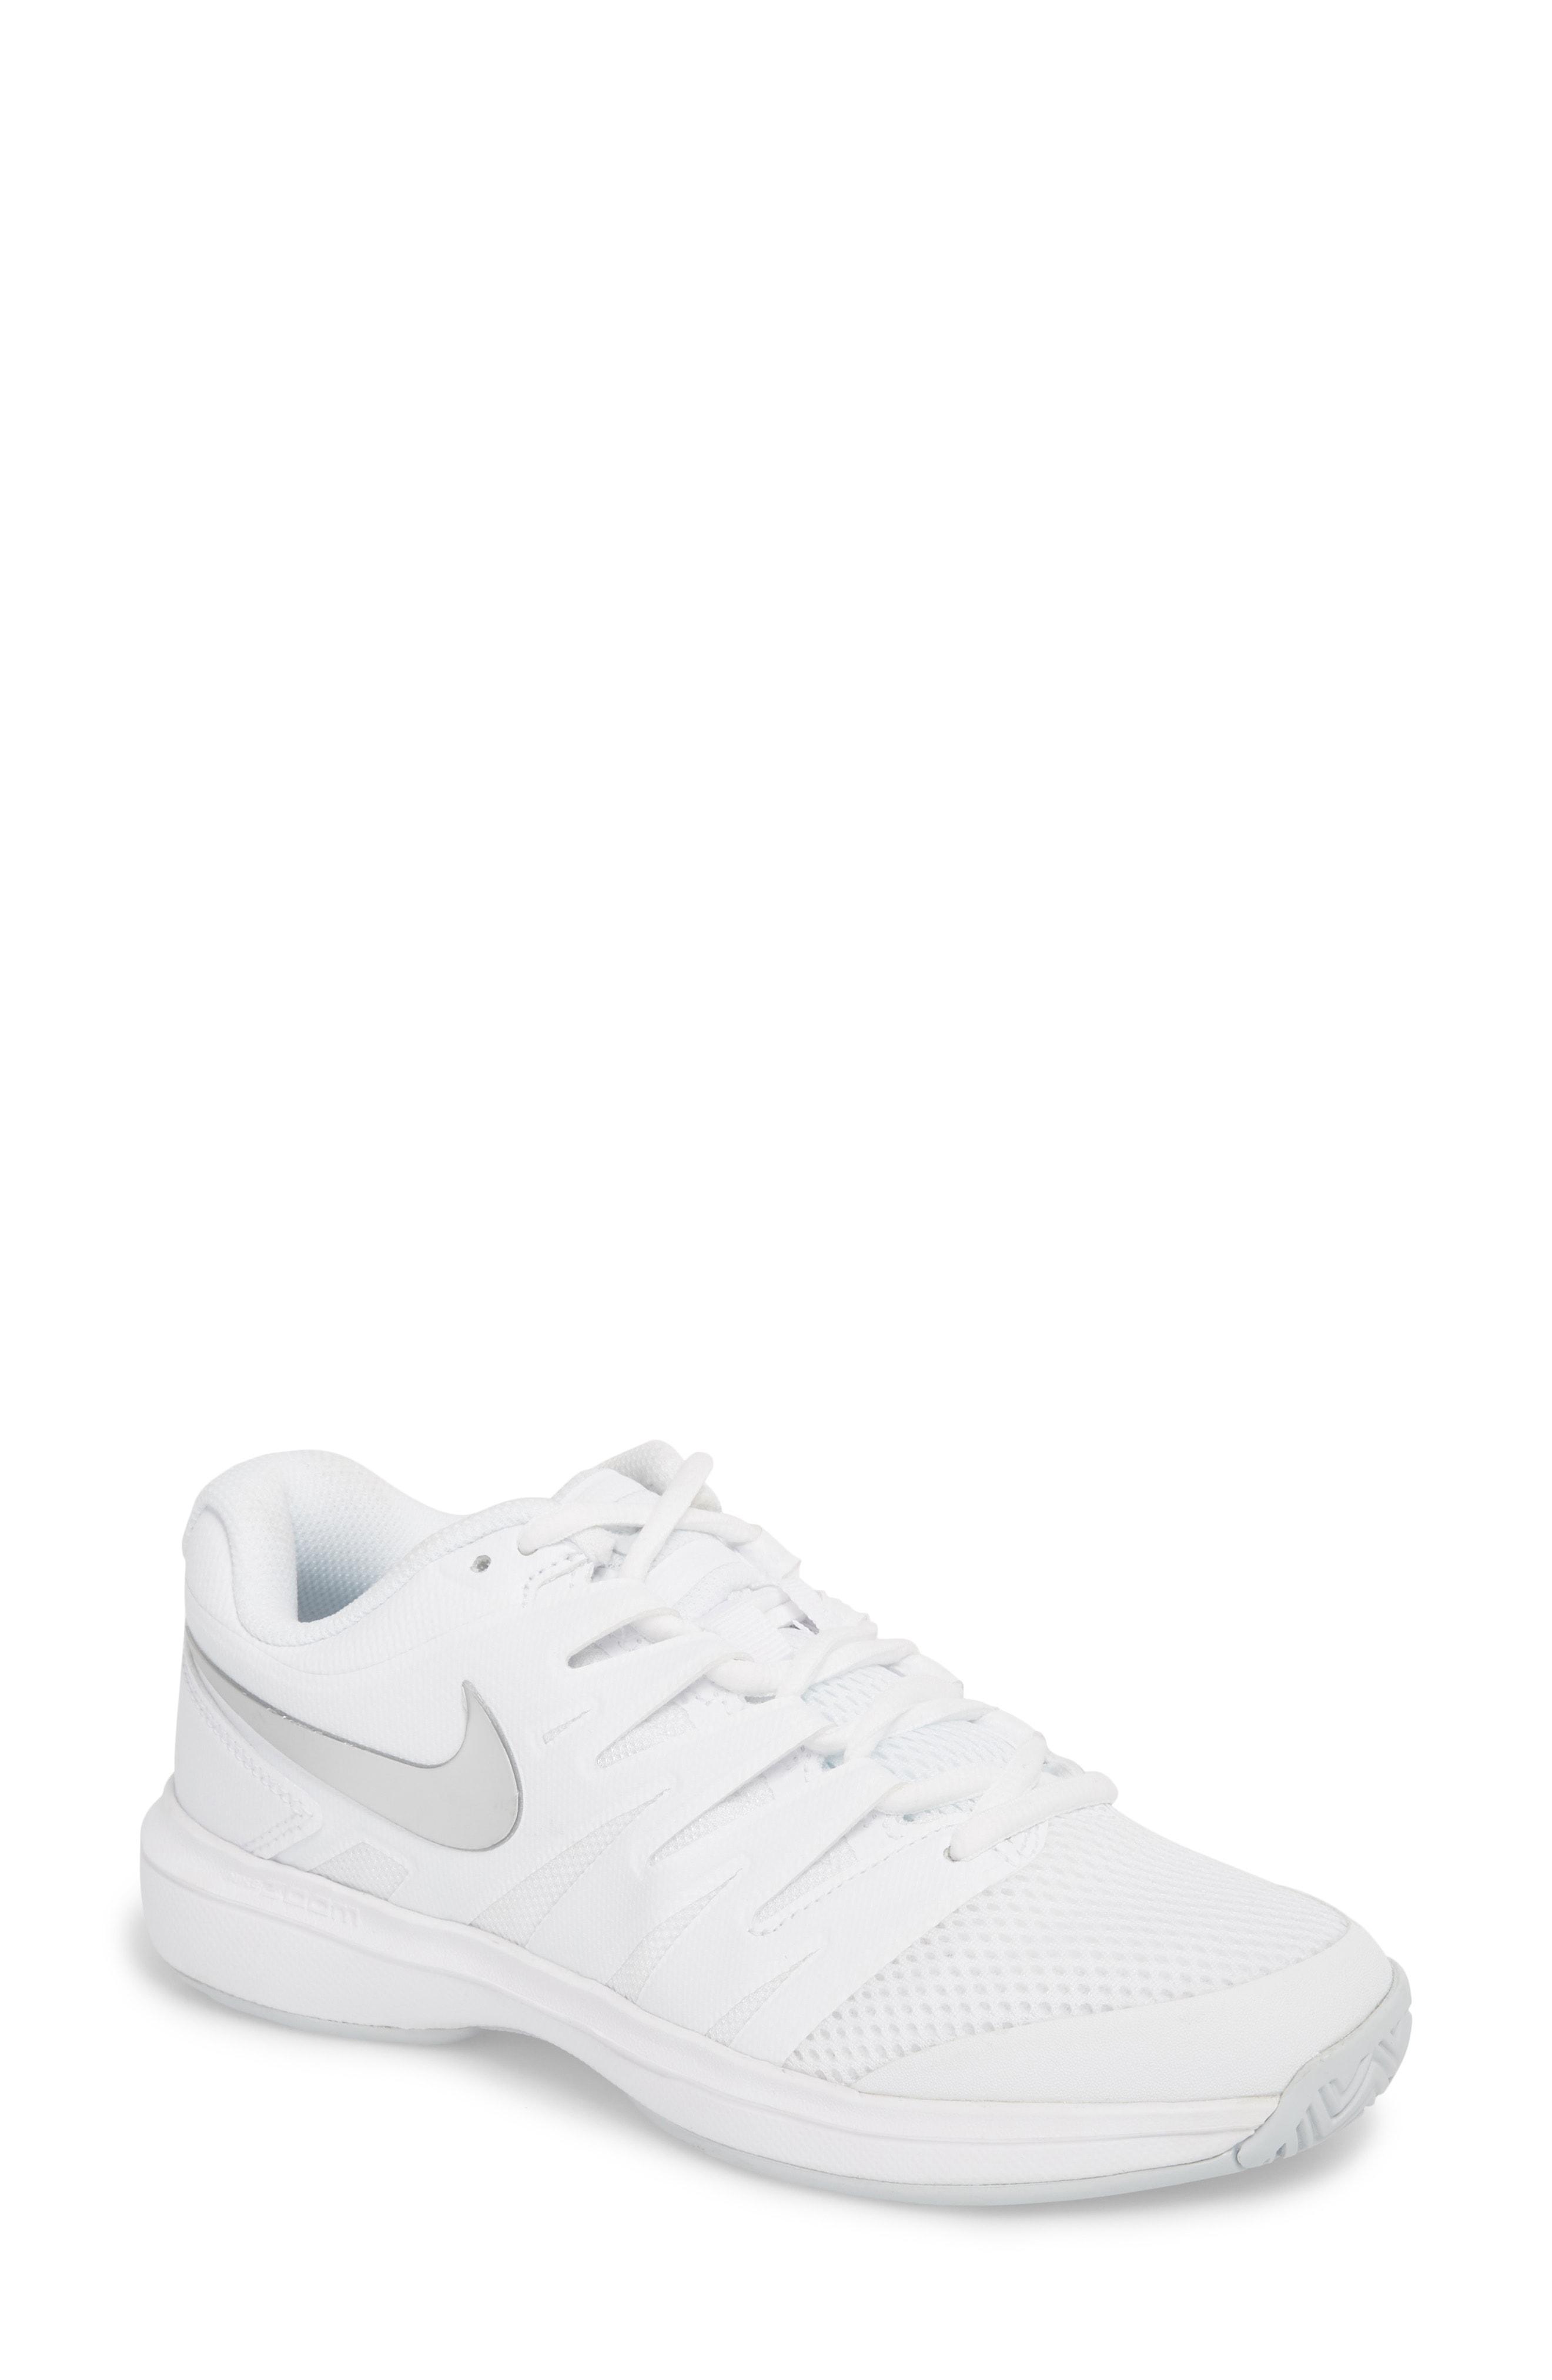 ea1810e25 nike-White-Metallic-Silver-Air-Zoom-Prestige-Tennis-Shoe.jpeg